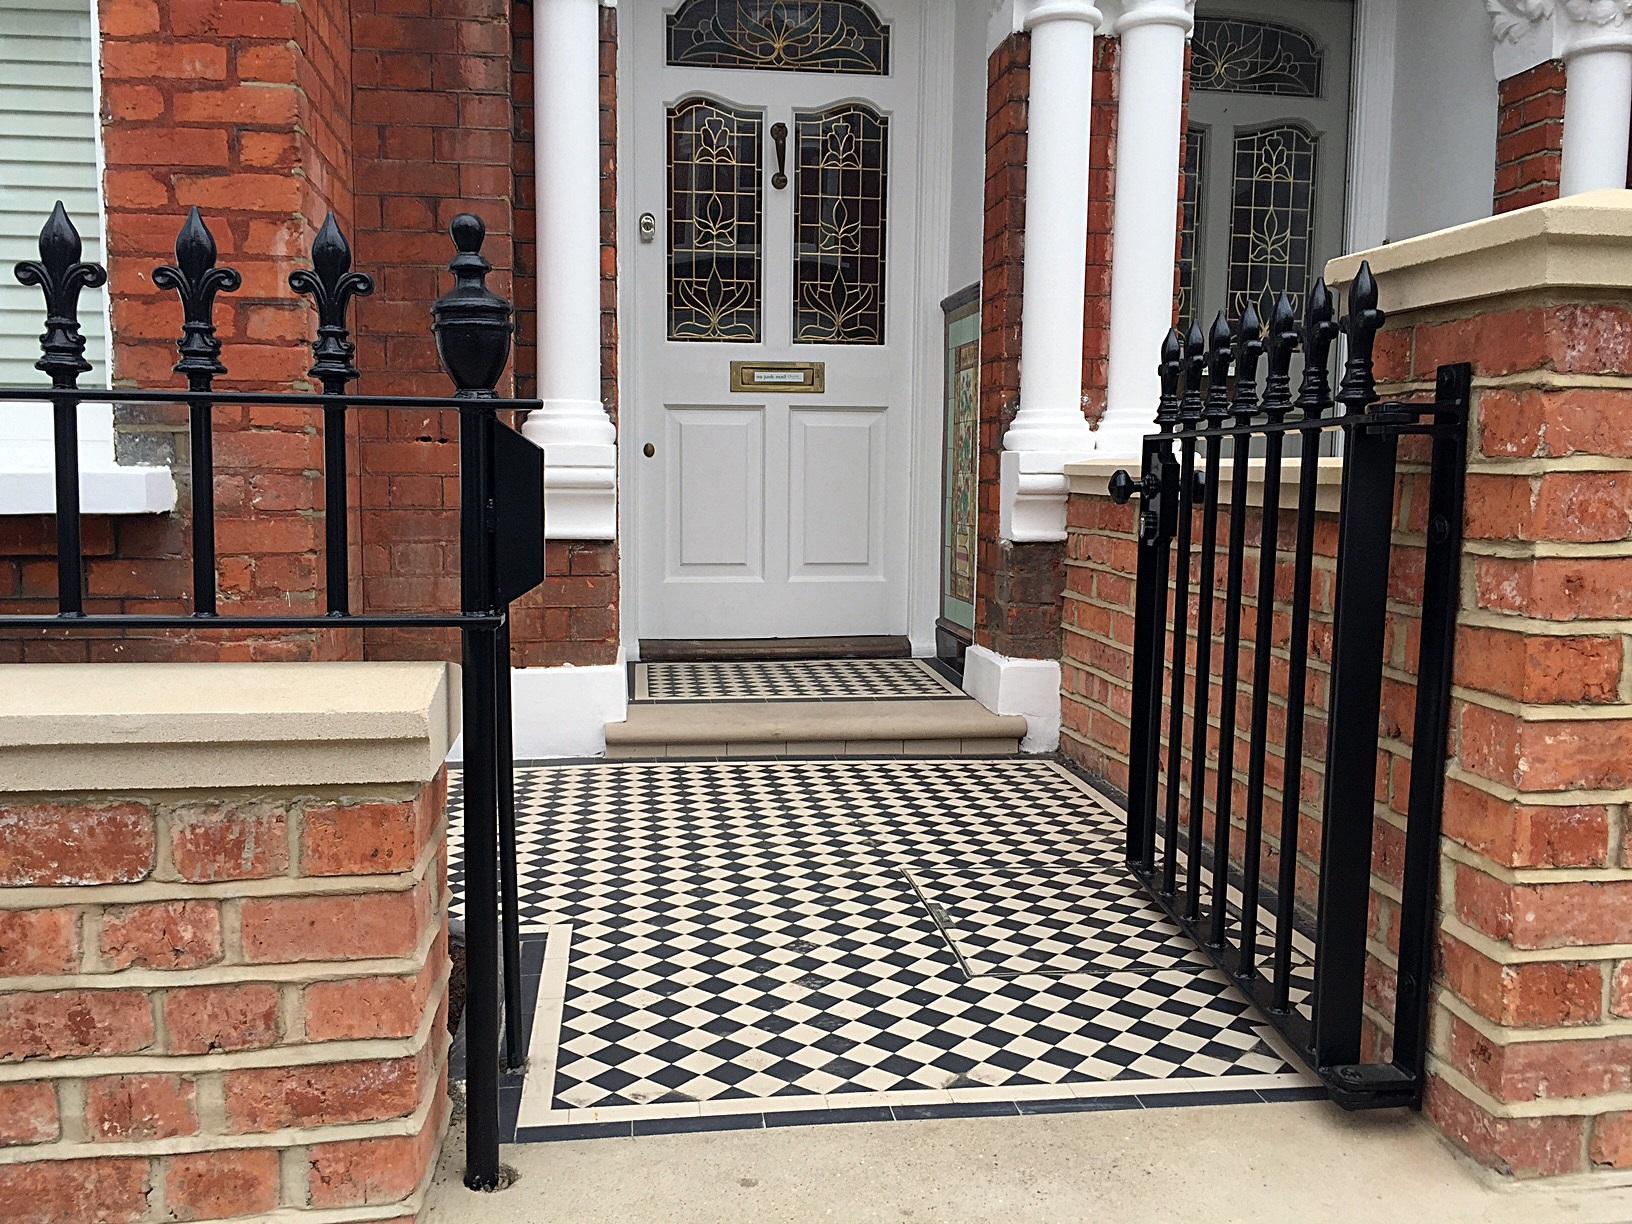 edwardian-london-garden-design-red-brick-front-wall-heavy-rails-gate-victrorian-mosaic-tile-path-battersea-clapham-fulham-chelsea_brick-wall-modern-garden_garden_olive-garden-menu-water-gardens-china-.jpg